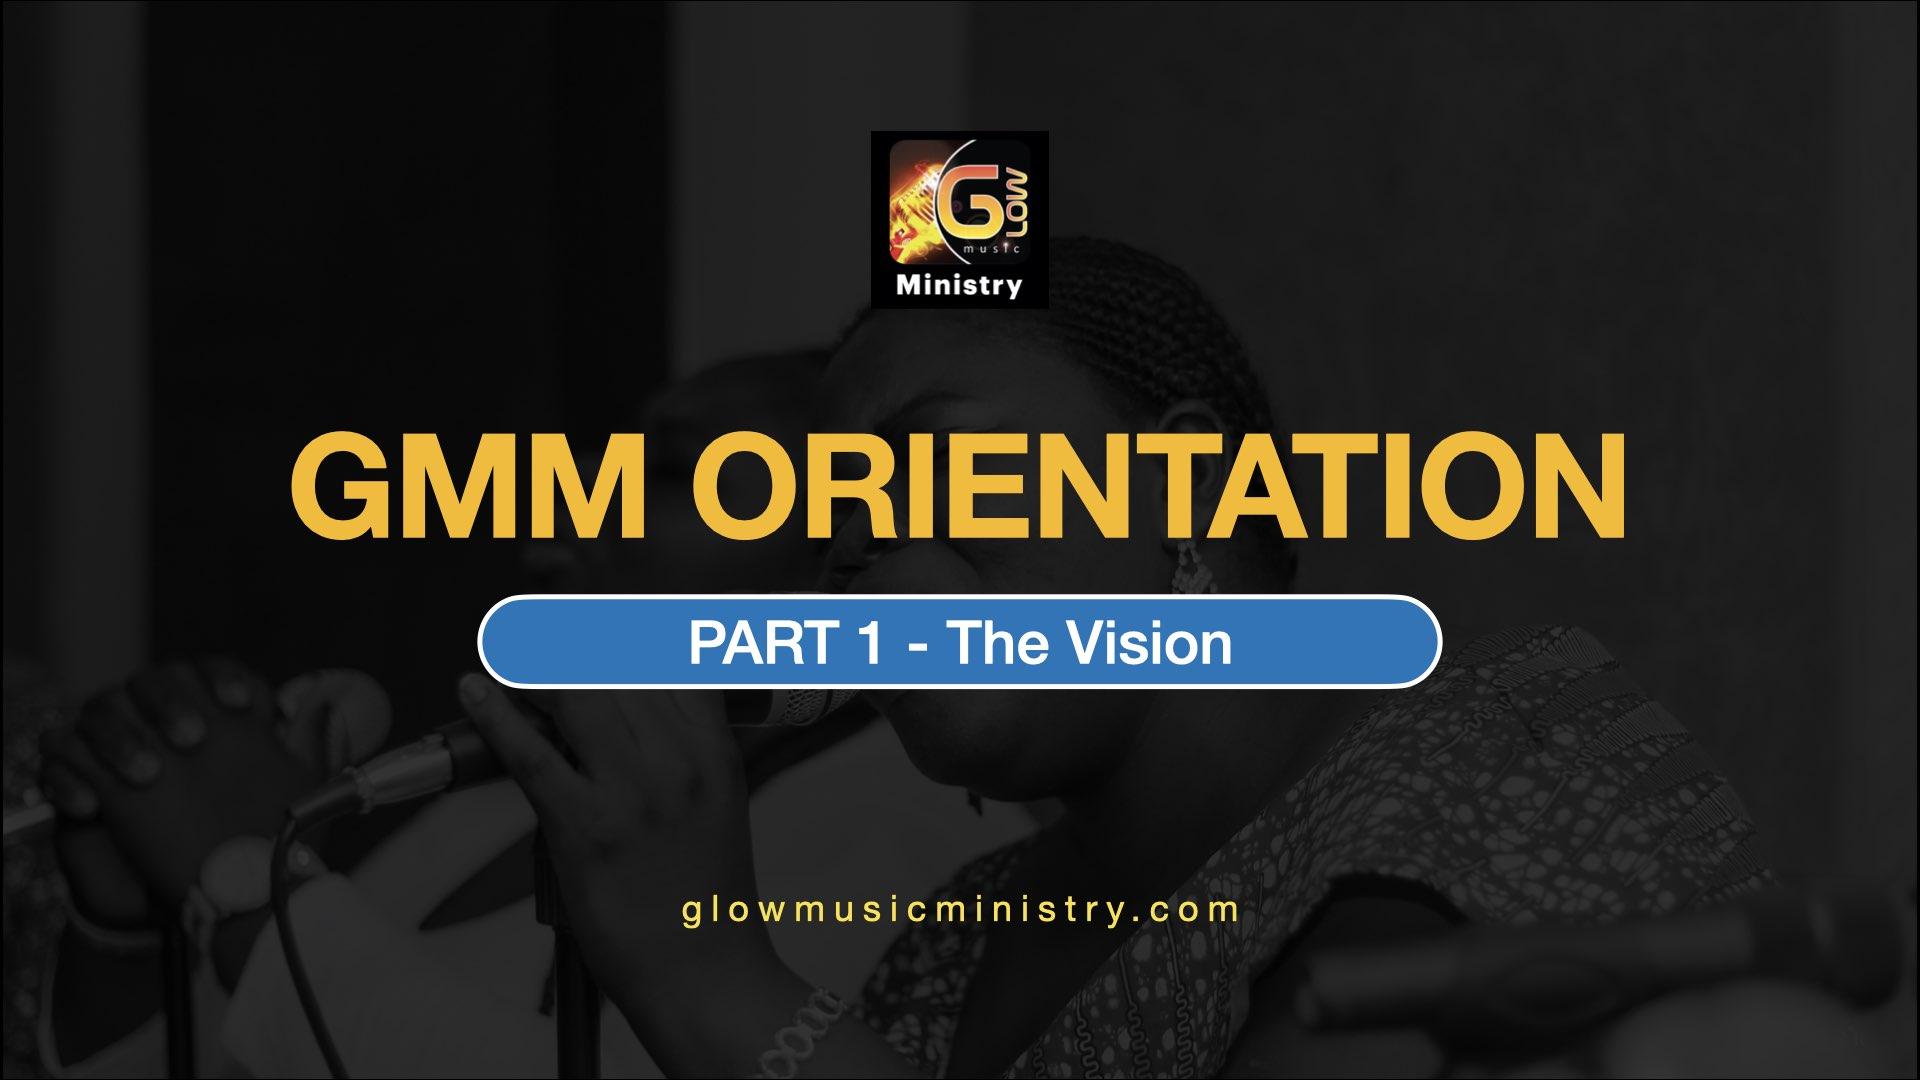 Glow Music Ministry Orientation - GMMO-01